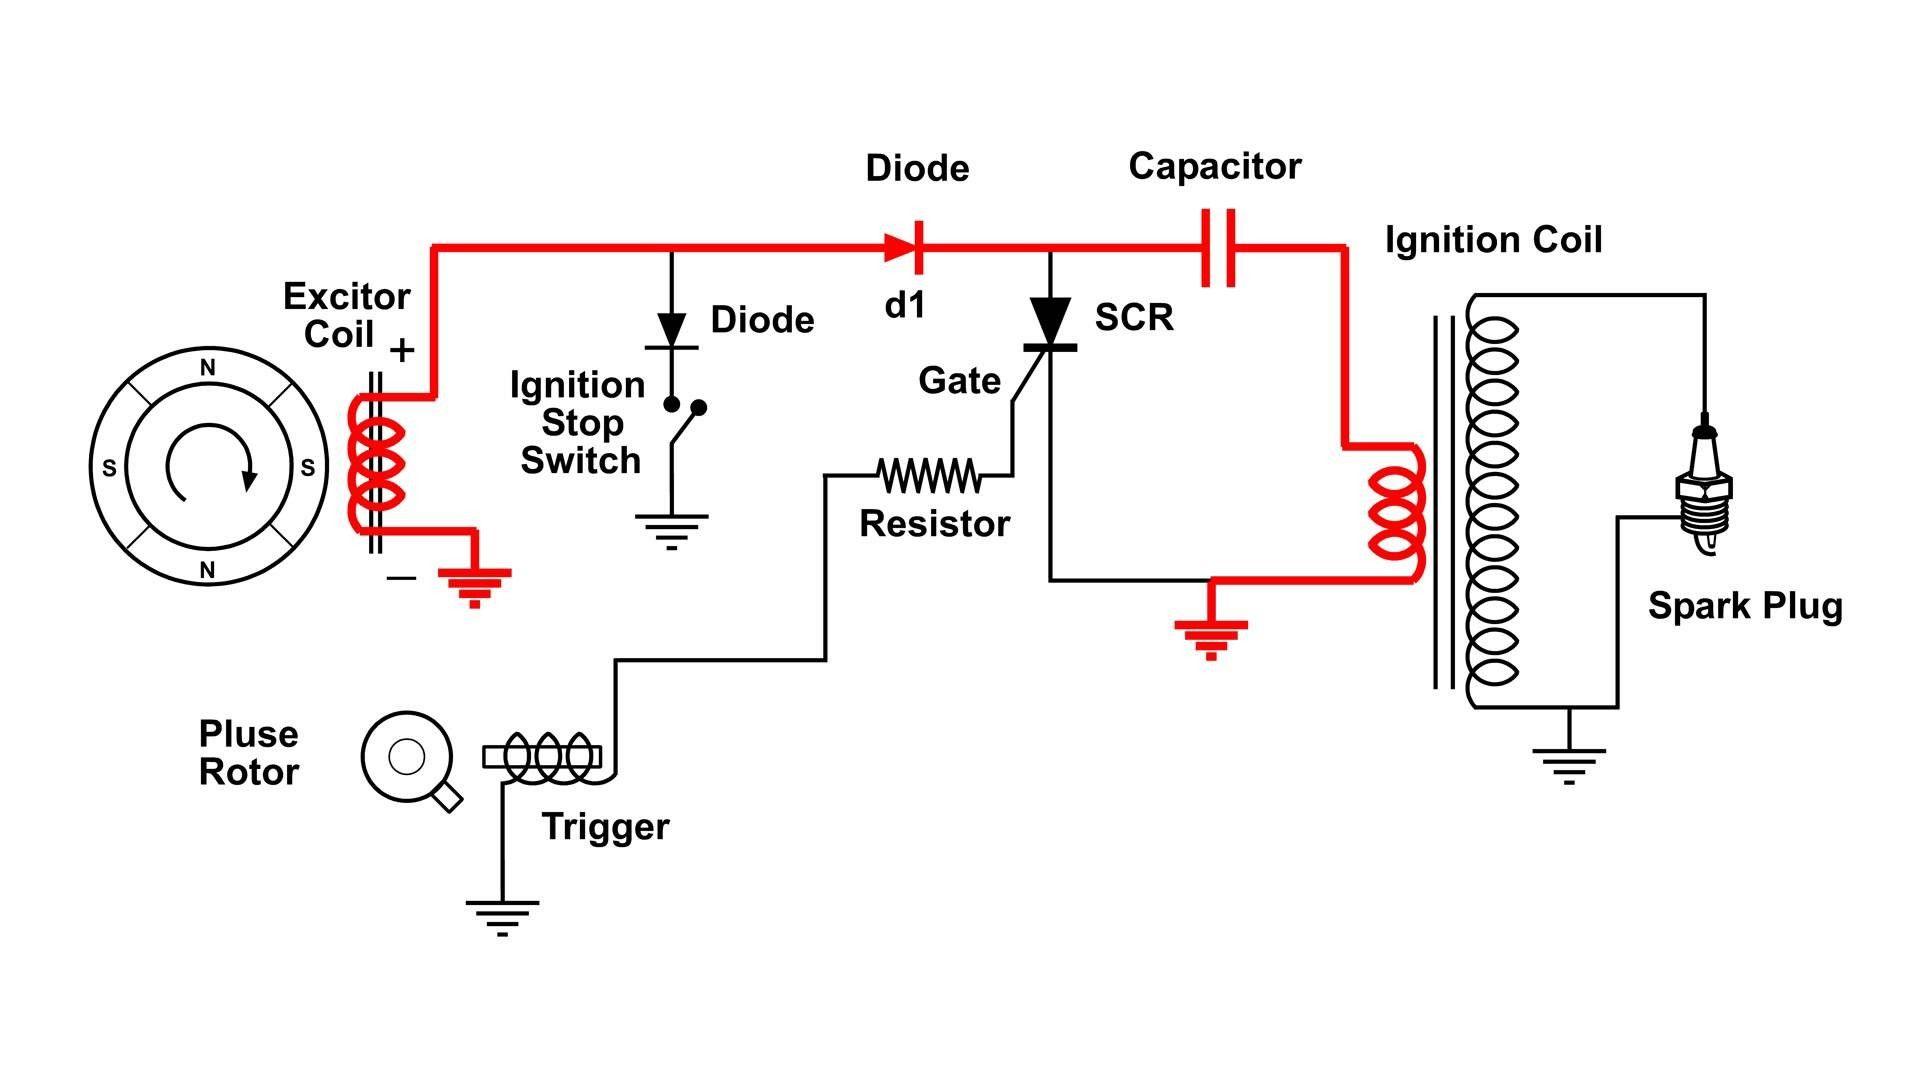 magneto wiring diagram wiring diagram mega magneto ignition system wiring diagram best cdi capacitor discharge tecumseh [ 1920 x 1080 Pixel ]